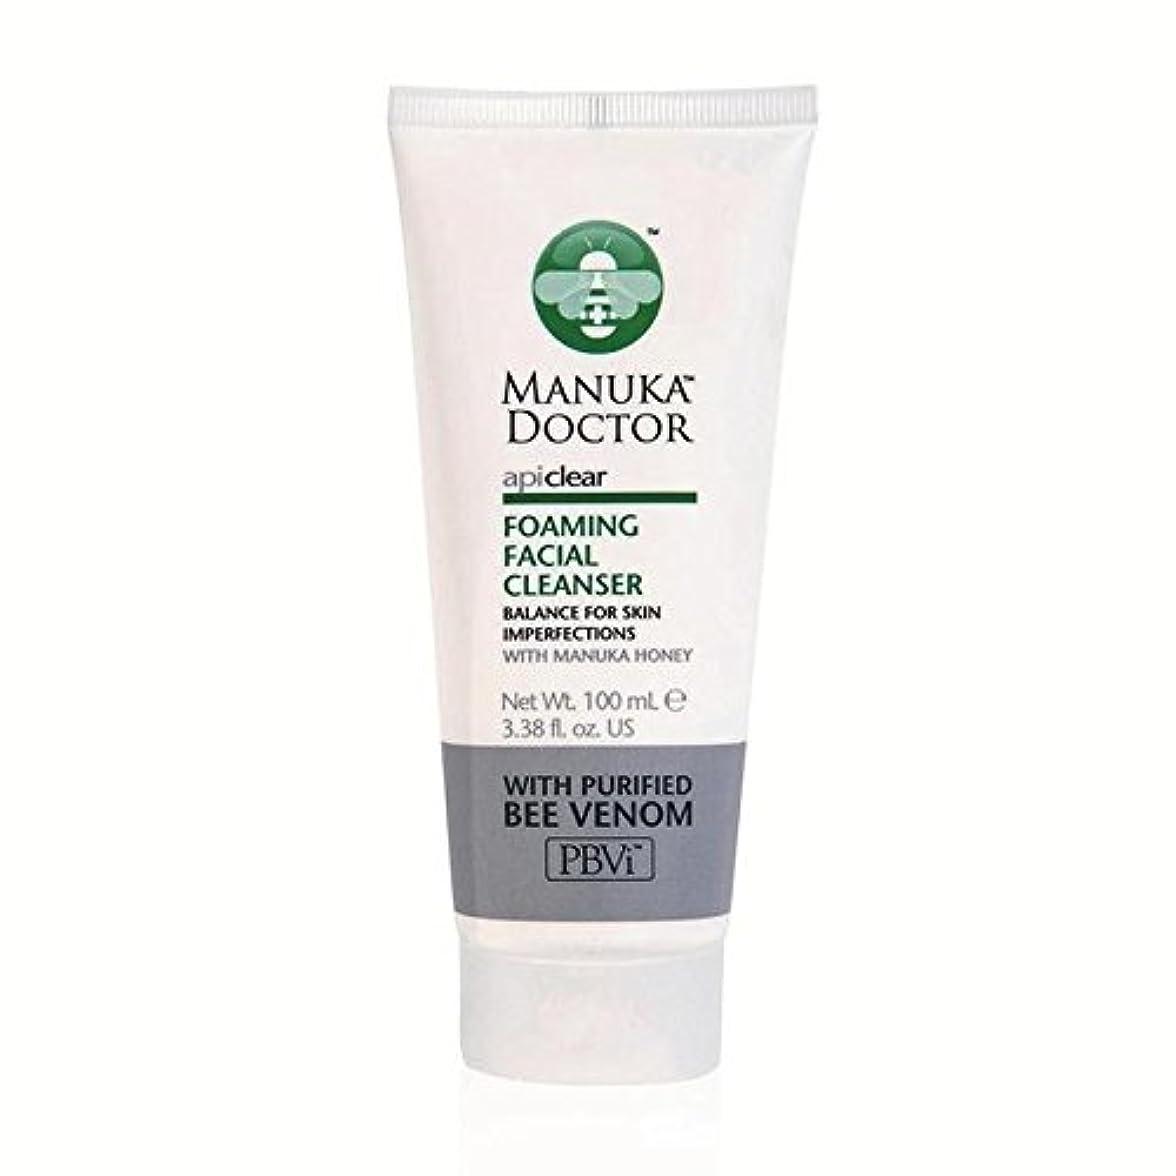 Manuka Doctor Api Clear Foaming Facial Cleanser 100ml (Pack of 6) - マヌカドクター明確な泡立ち洗顔料の100ミリリットル x6 [並行輸入品]